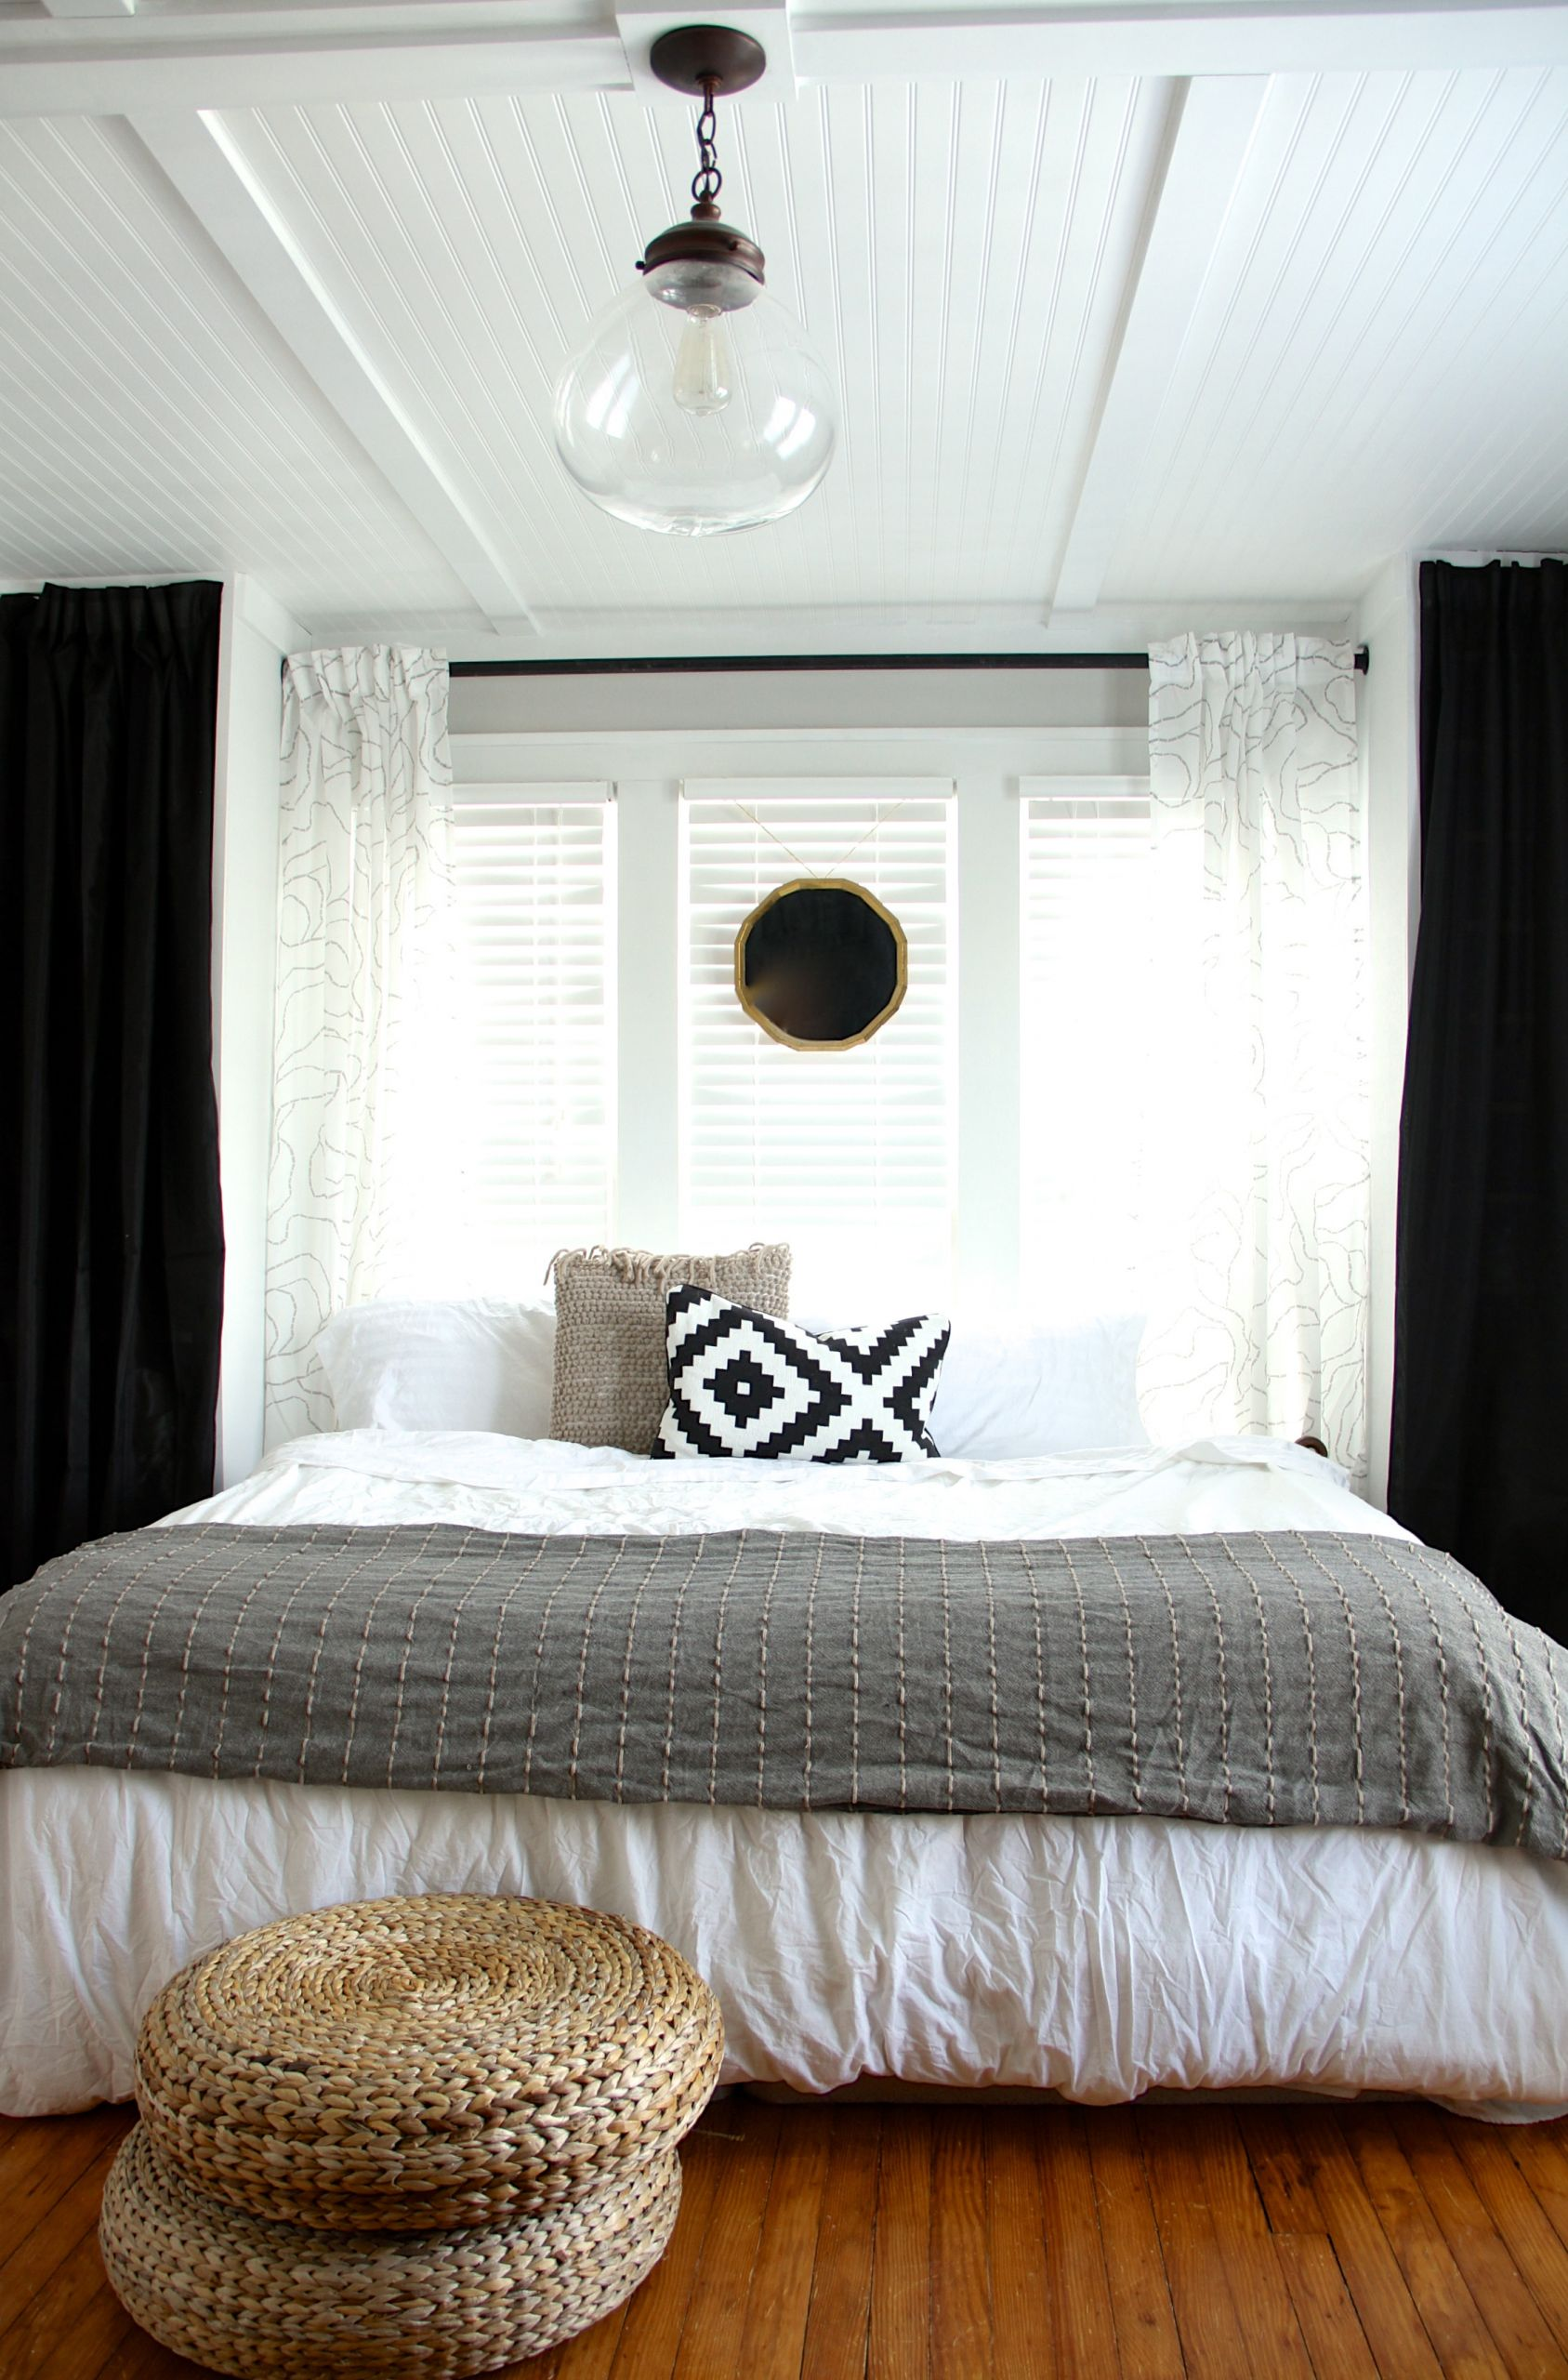 Ceiling Lights Bedroom  Excellent Bedroom Ceiling Lights Ideas Hupehome